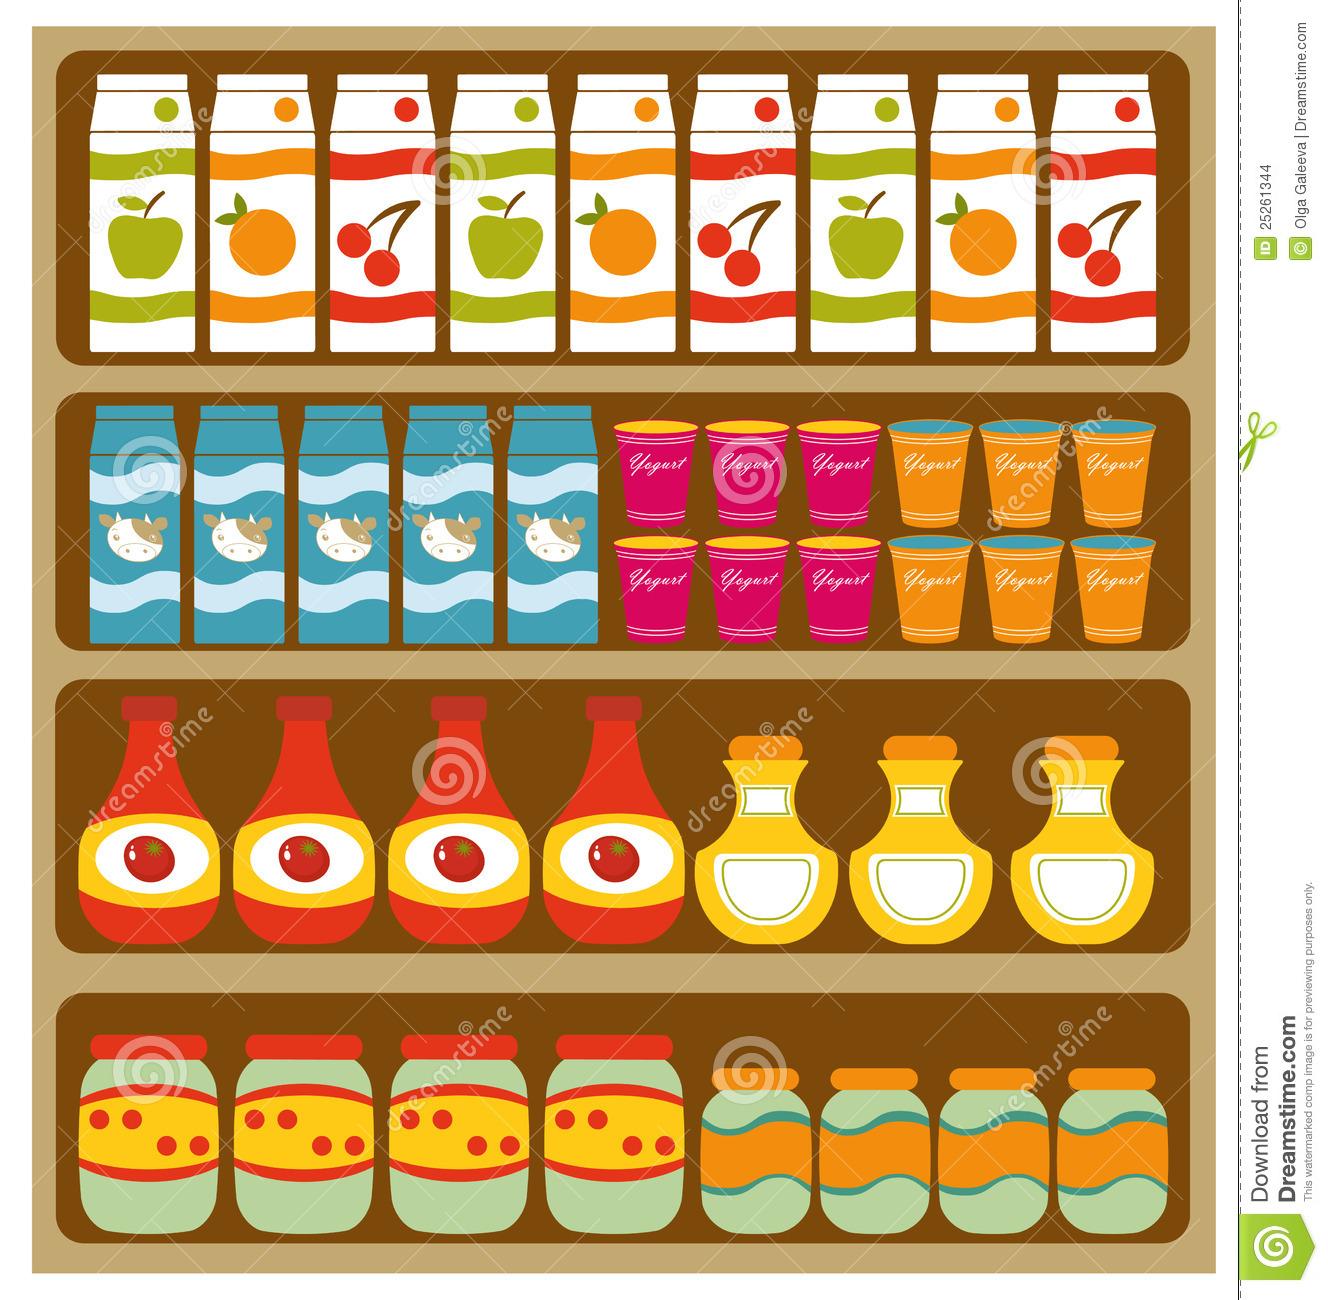 supermarket shelves clipart 20 free Cliparts | Download ...